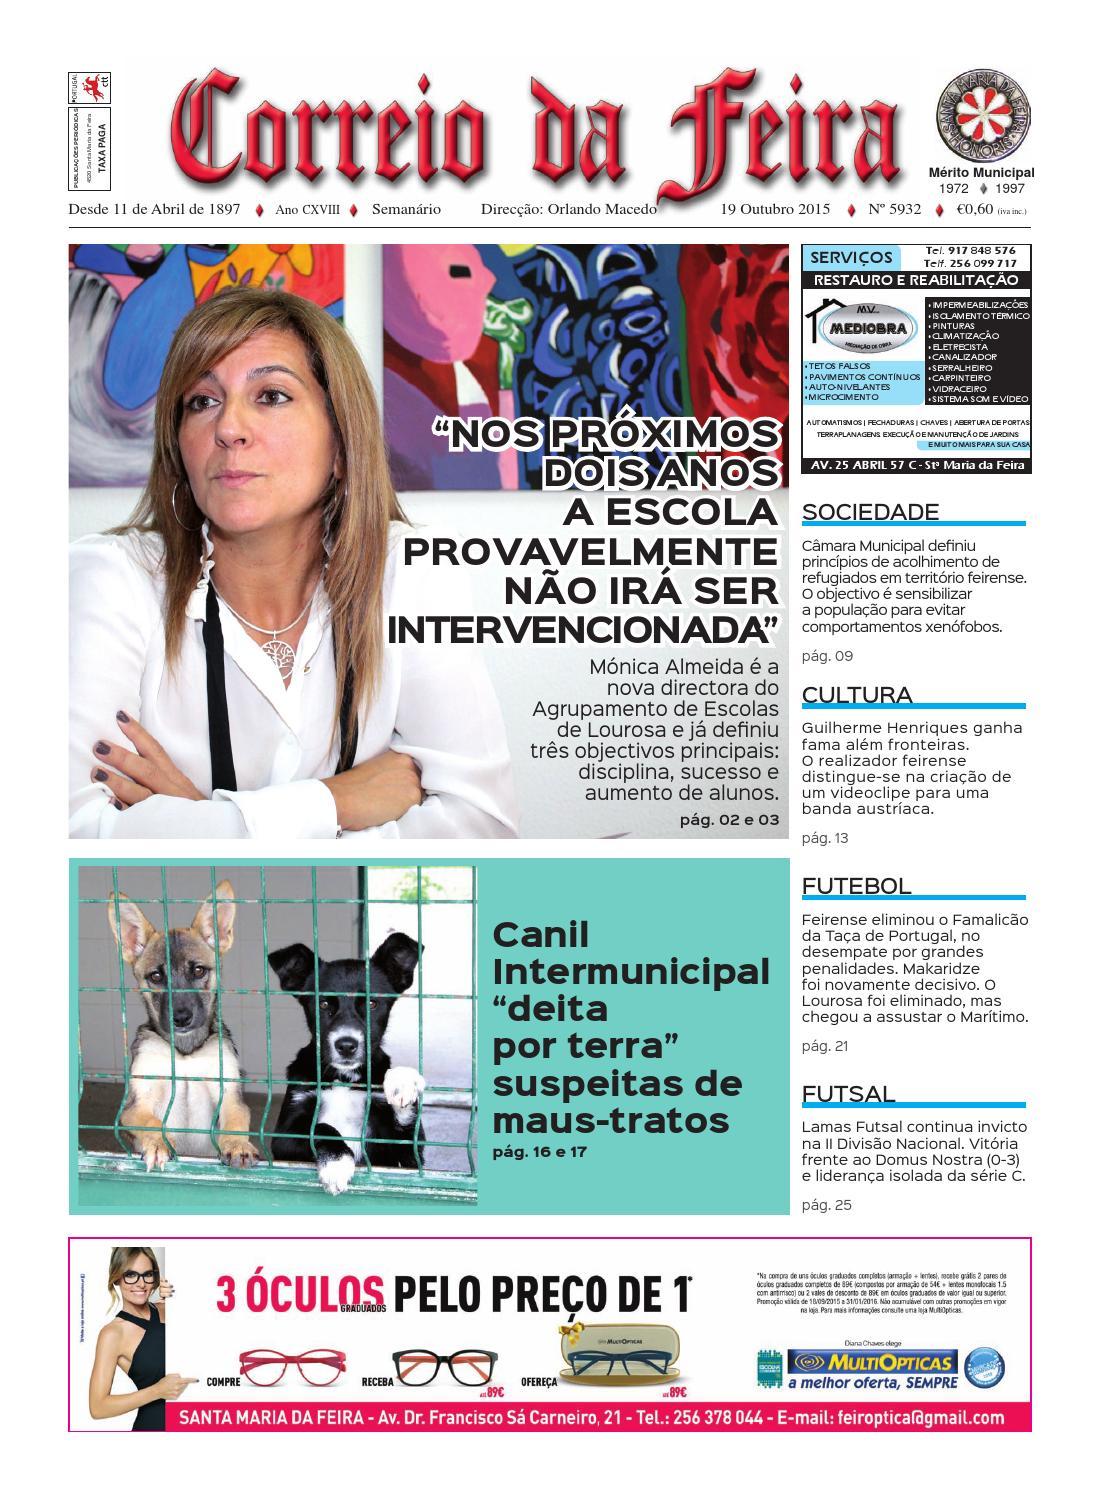 836e0e4fd3ca2 5932 by Pedro Almeida - issuu